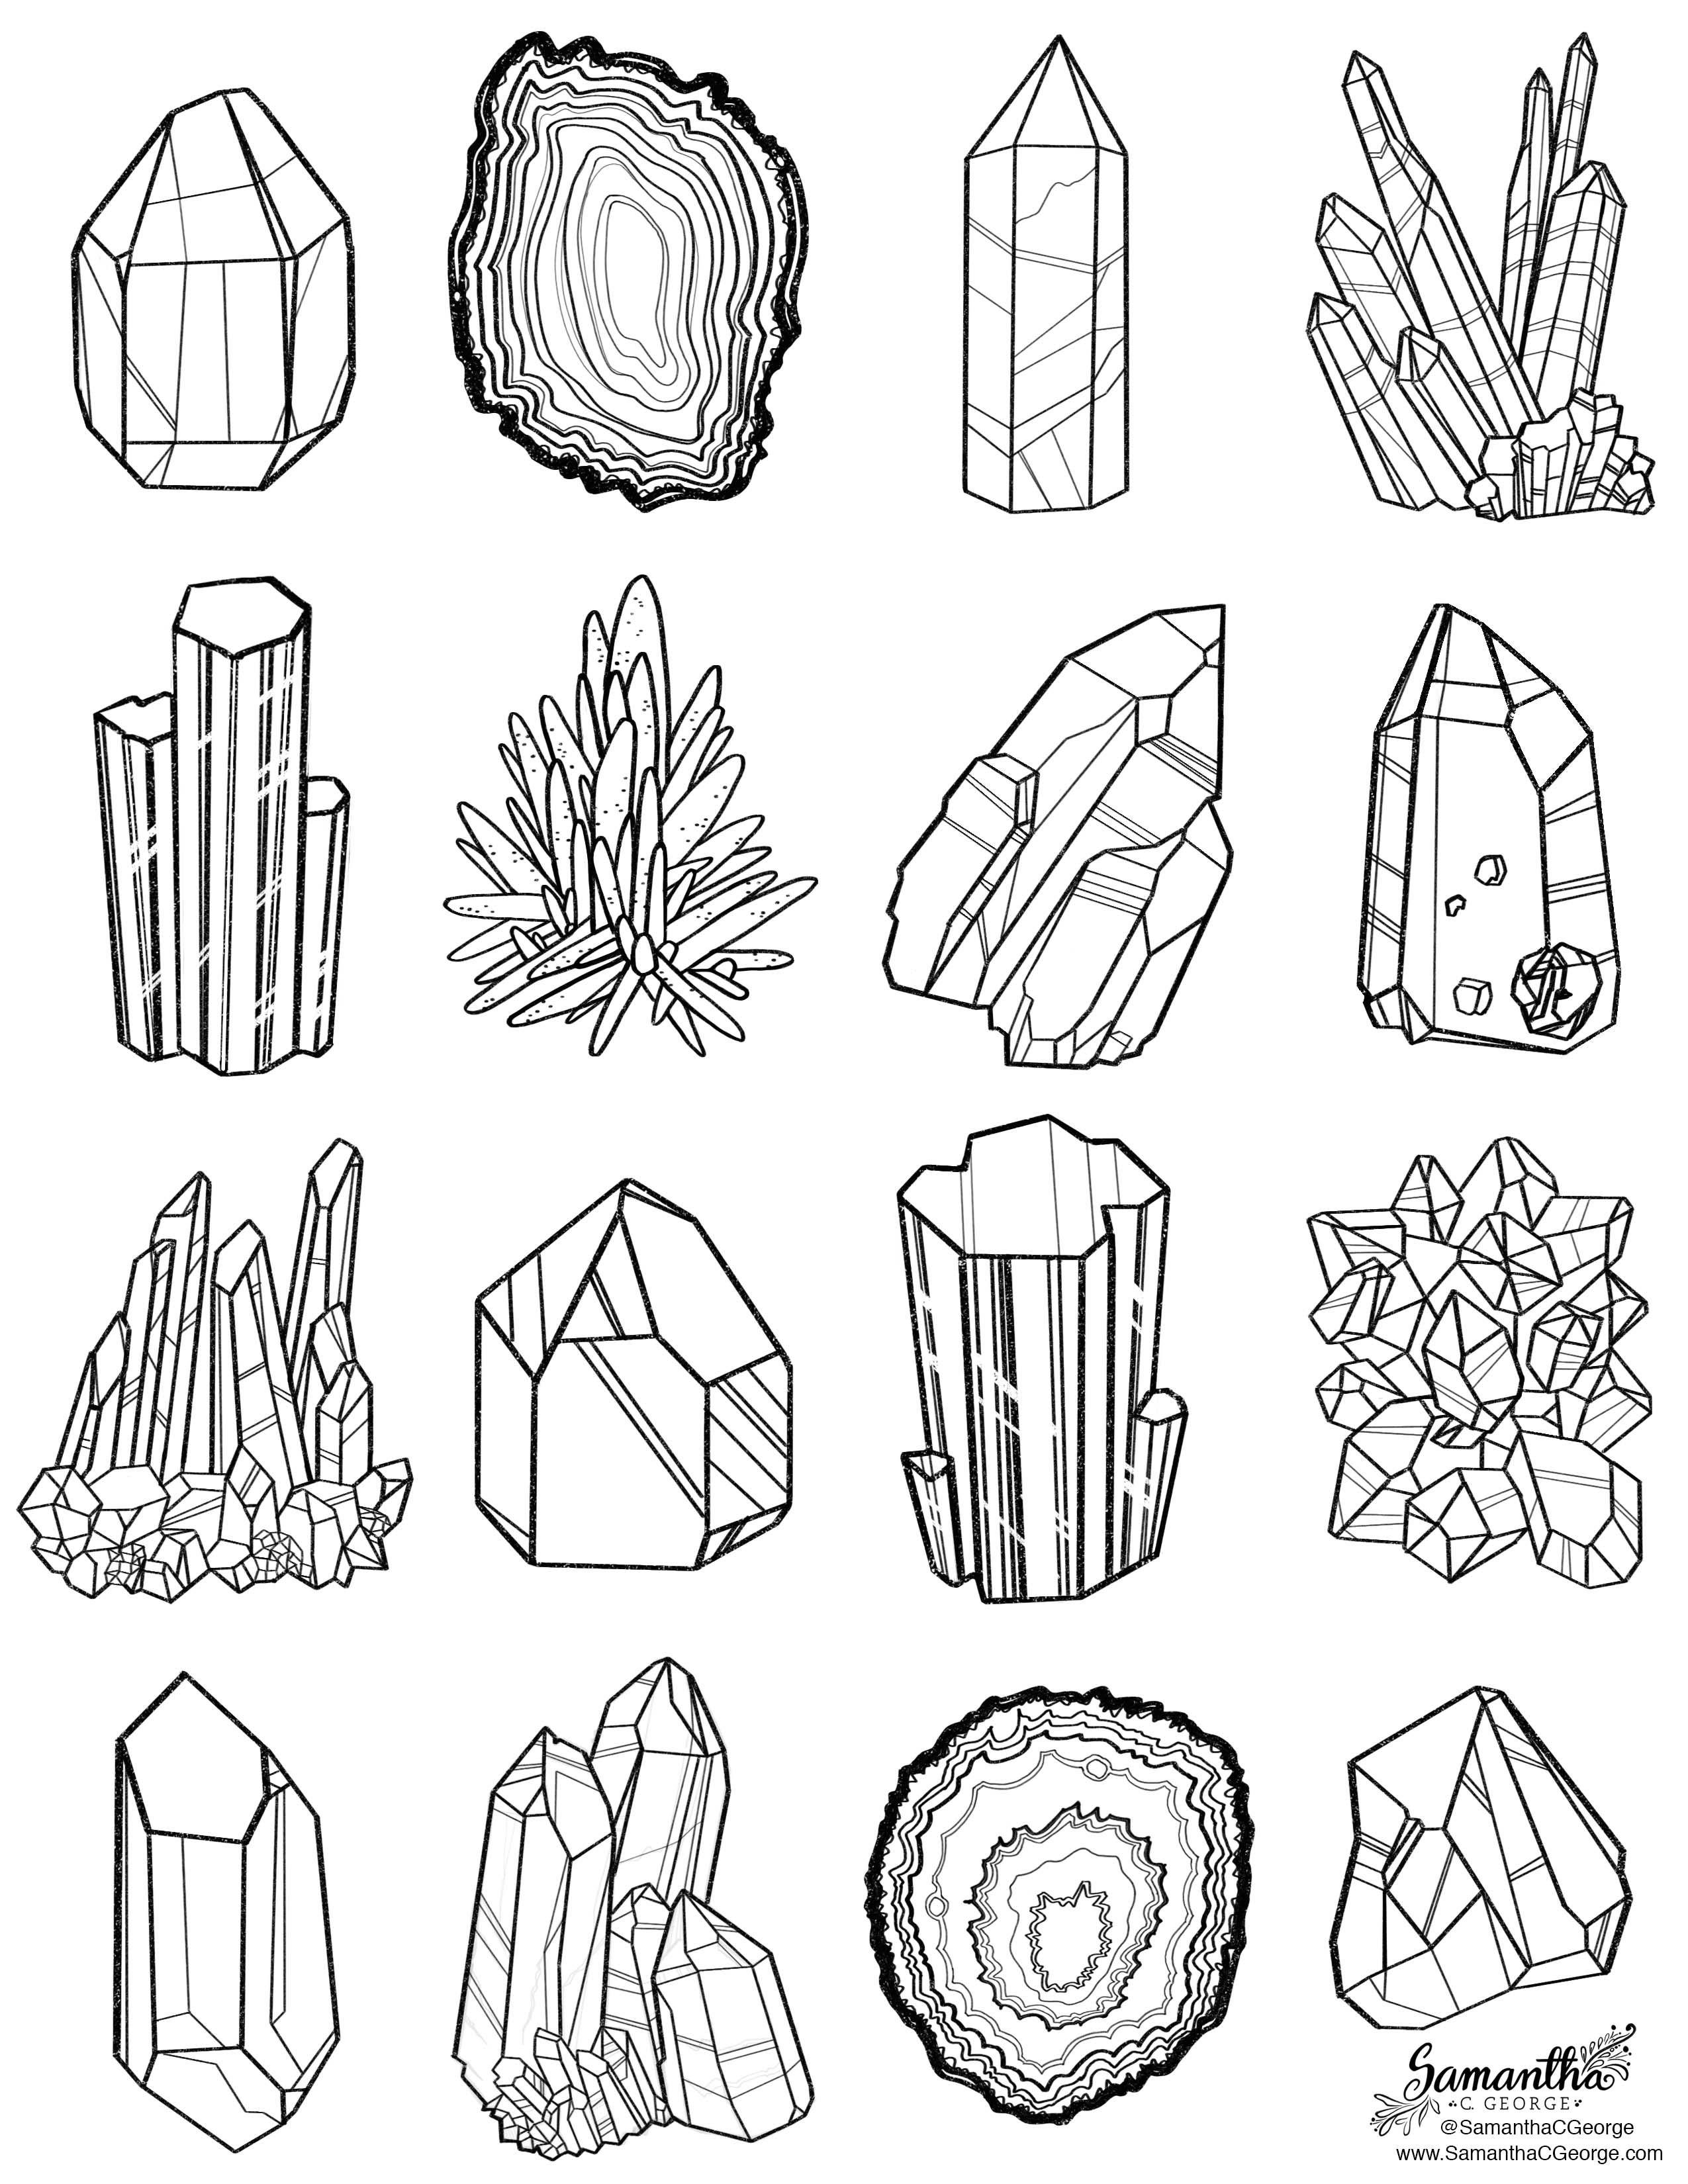 Gem clipart coloring page. Printable printables drawings art